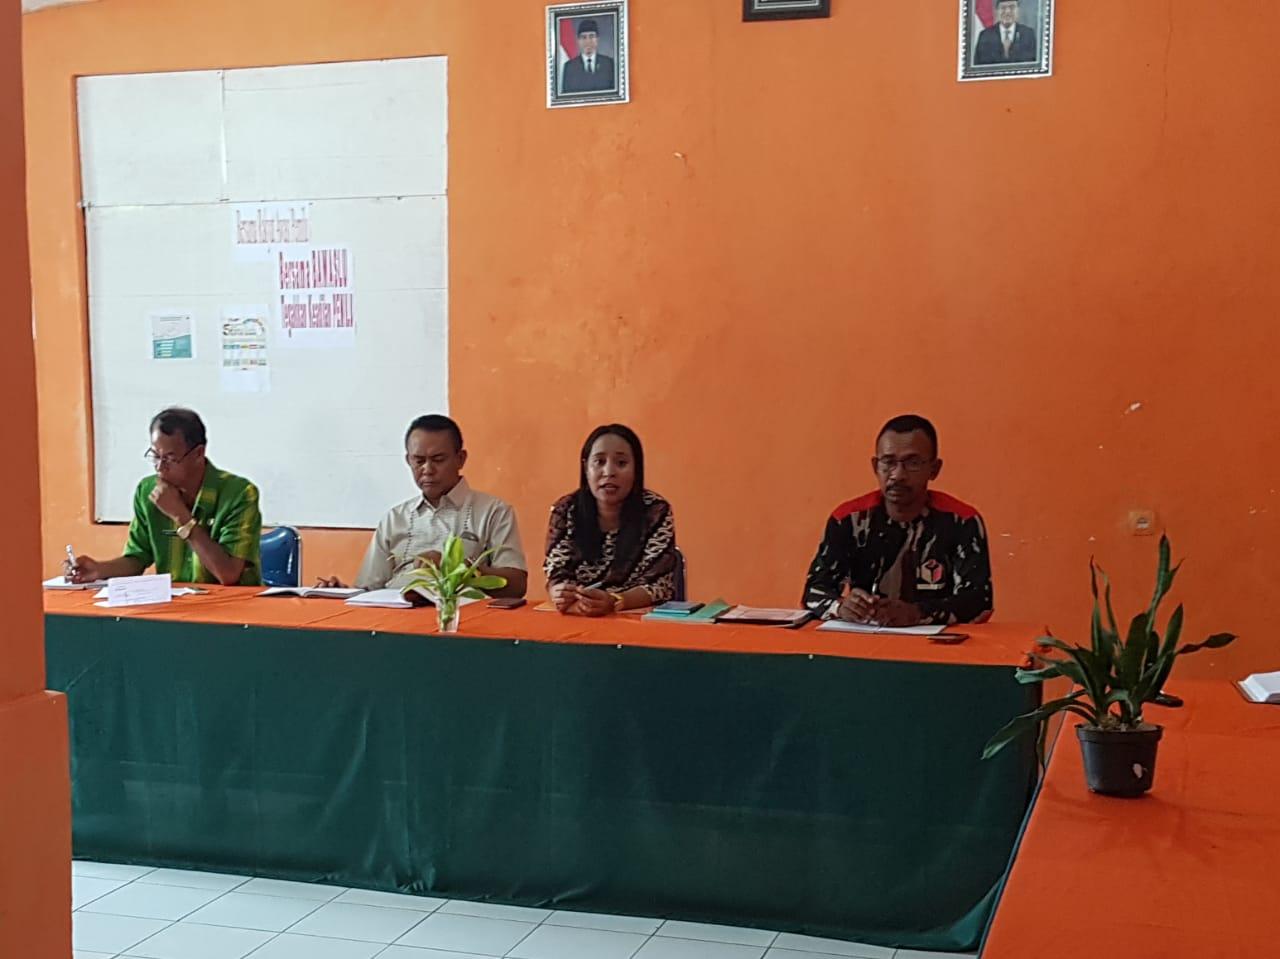 Bawaslu Sumba Barat Gelar Rapat Koordinasi Persamaan Persepsi Terkait Pemasangan APK PEMILU Tahun 2019